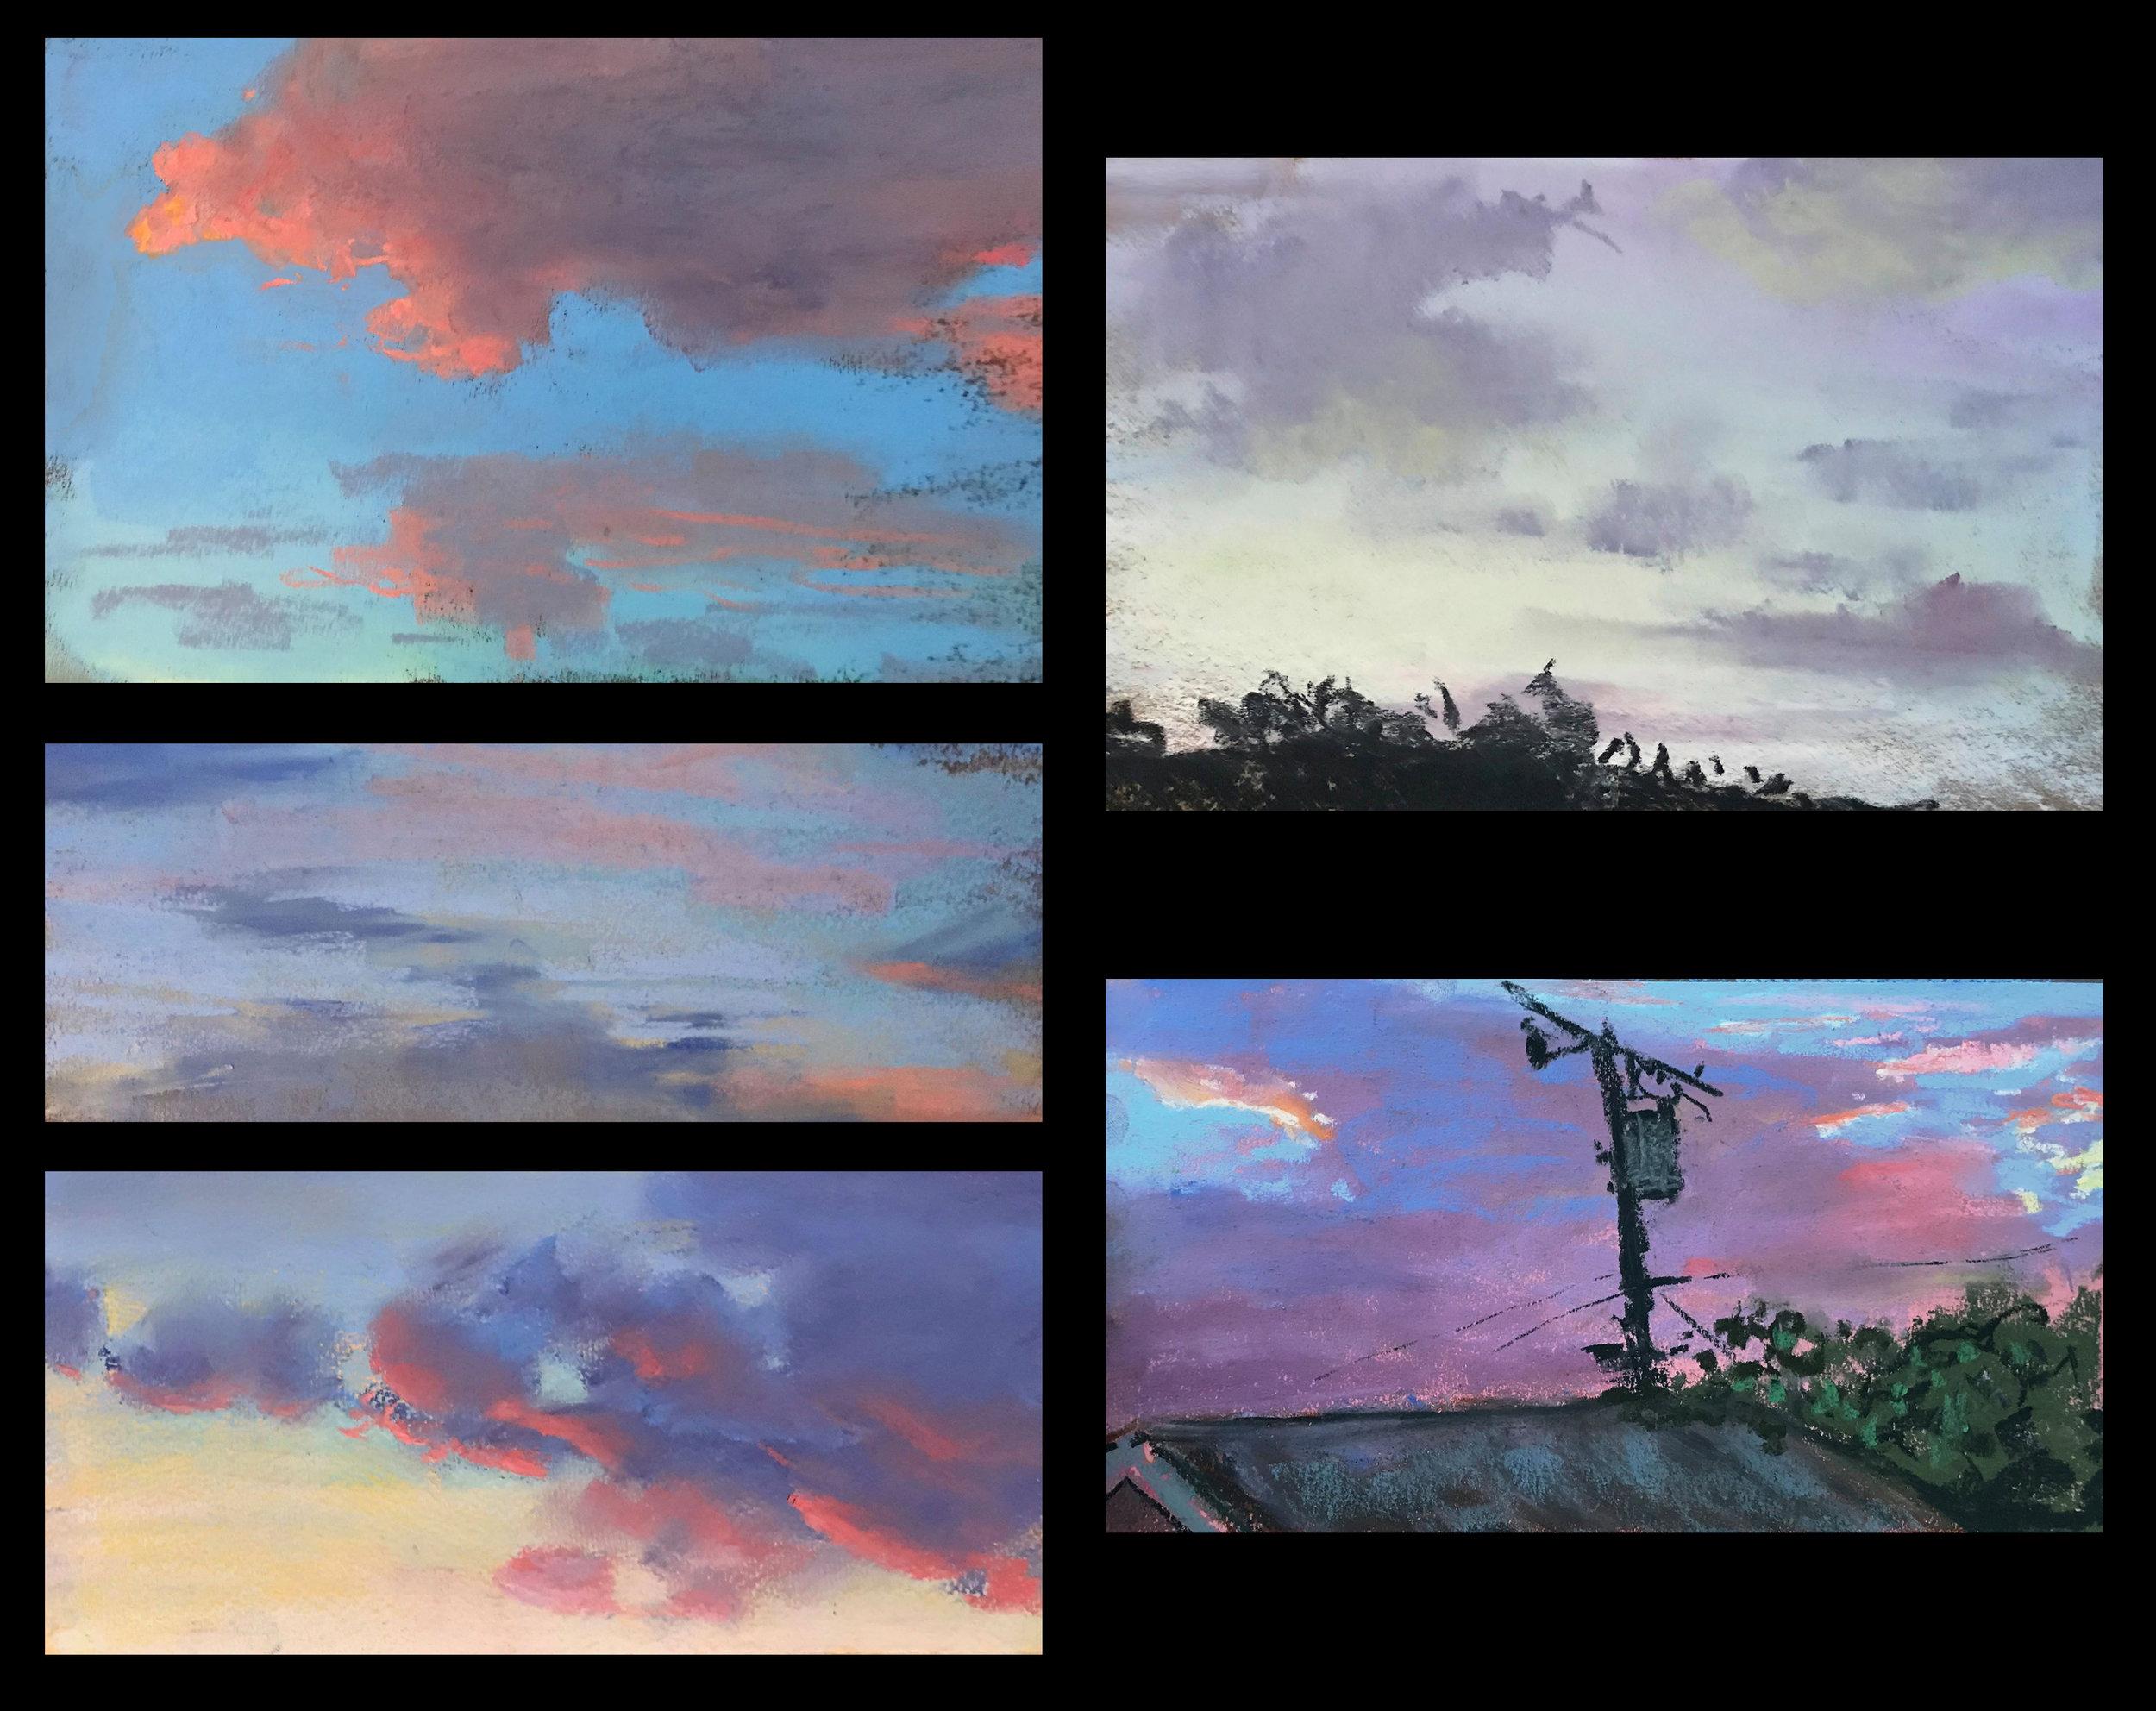 Sunset+Study+01.jpg